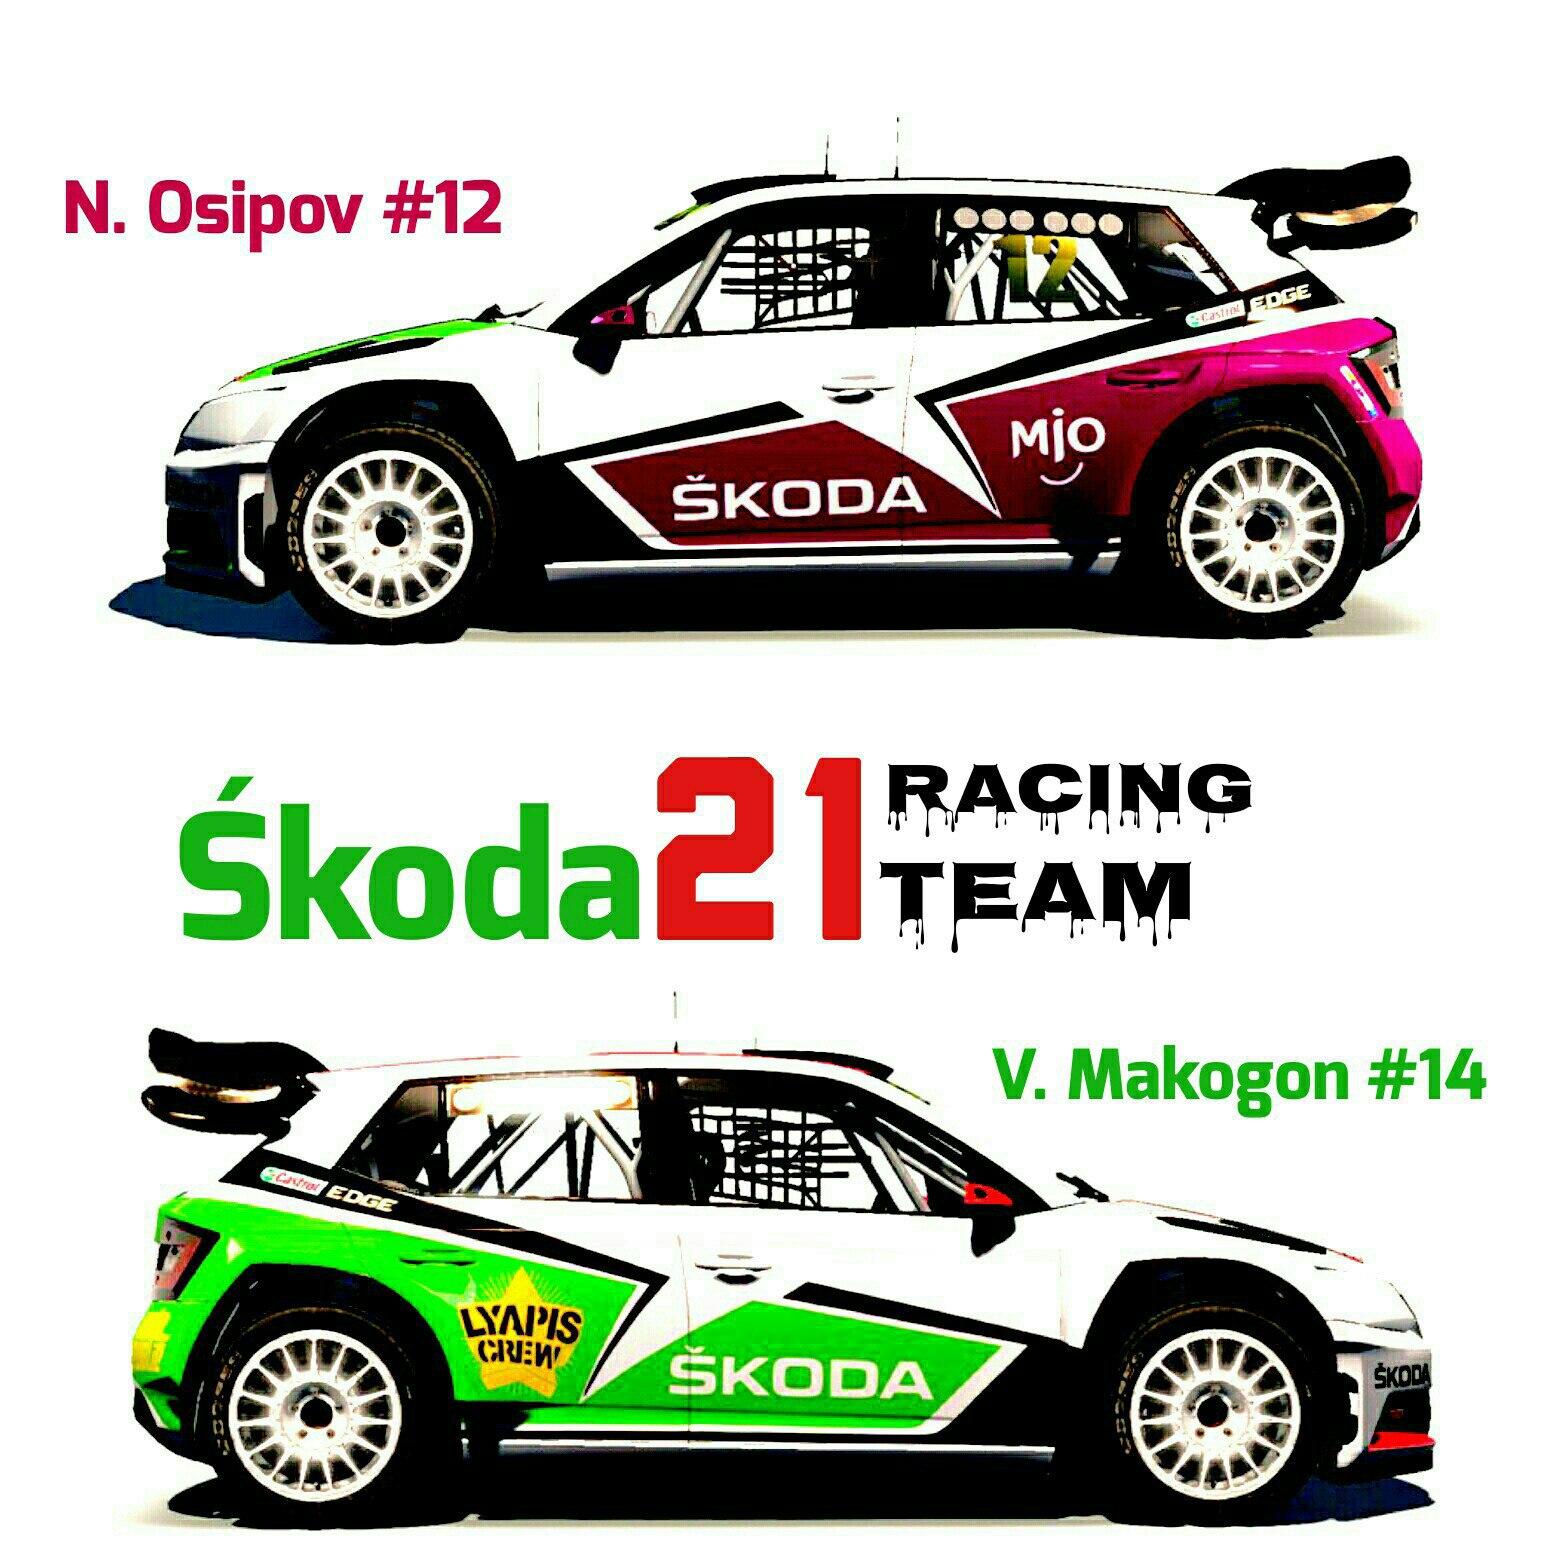 Skoda 21 Racing Team